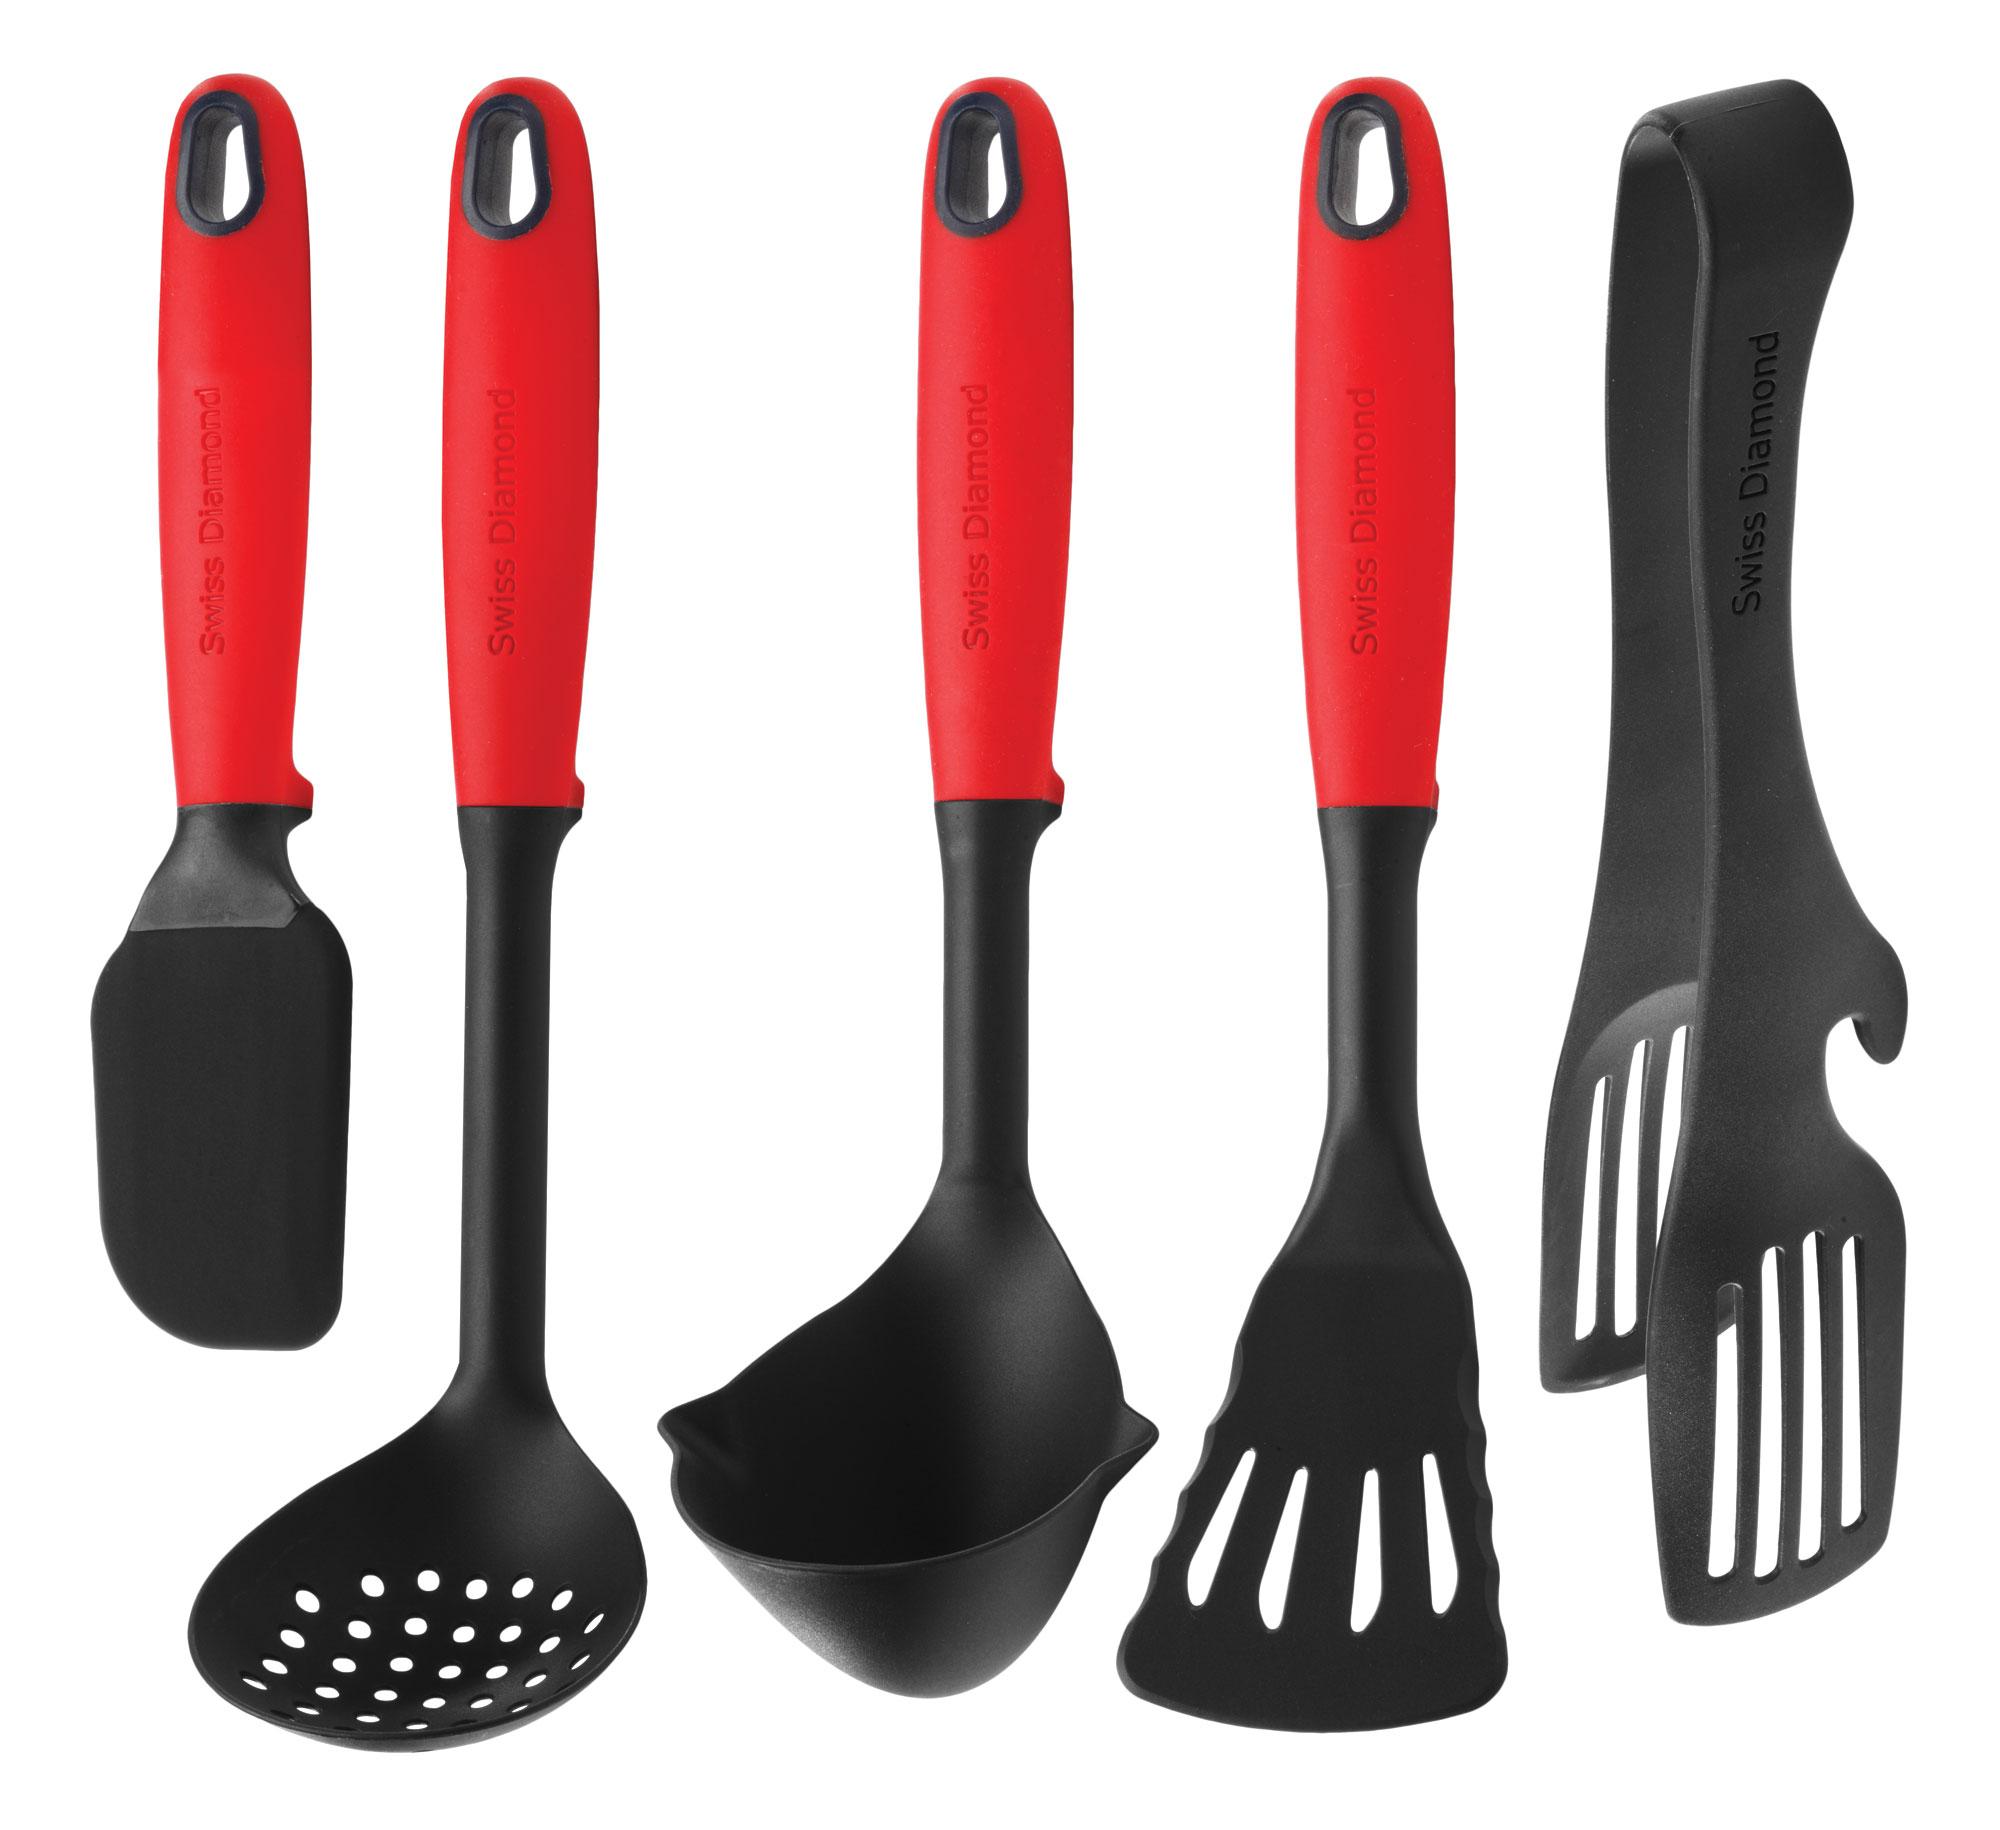 Swiss diamond kitchen utensil set 5 piece cutlery and more for Kitchen set utensils